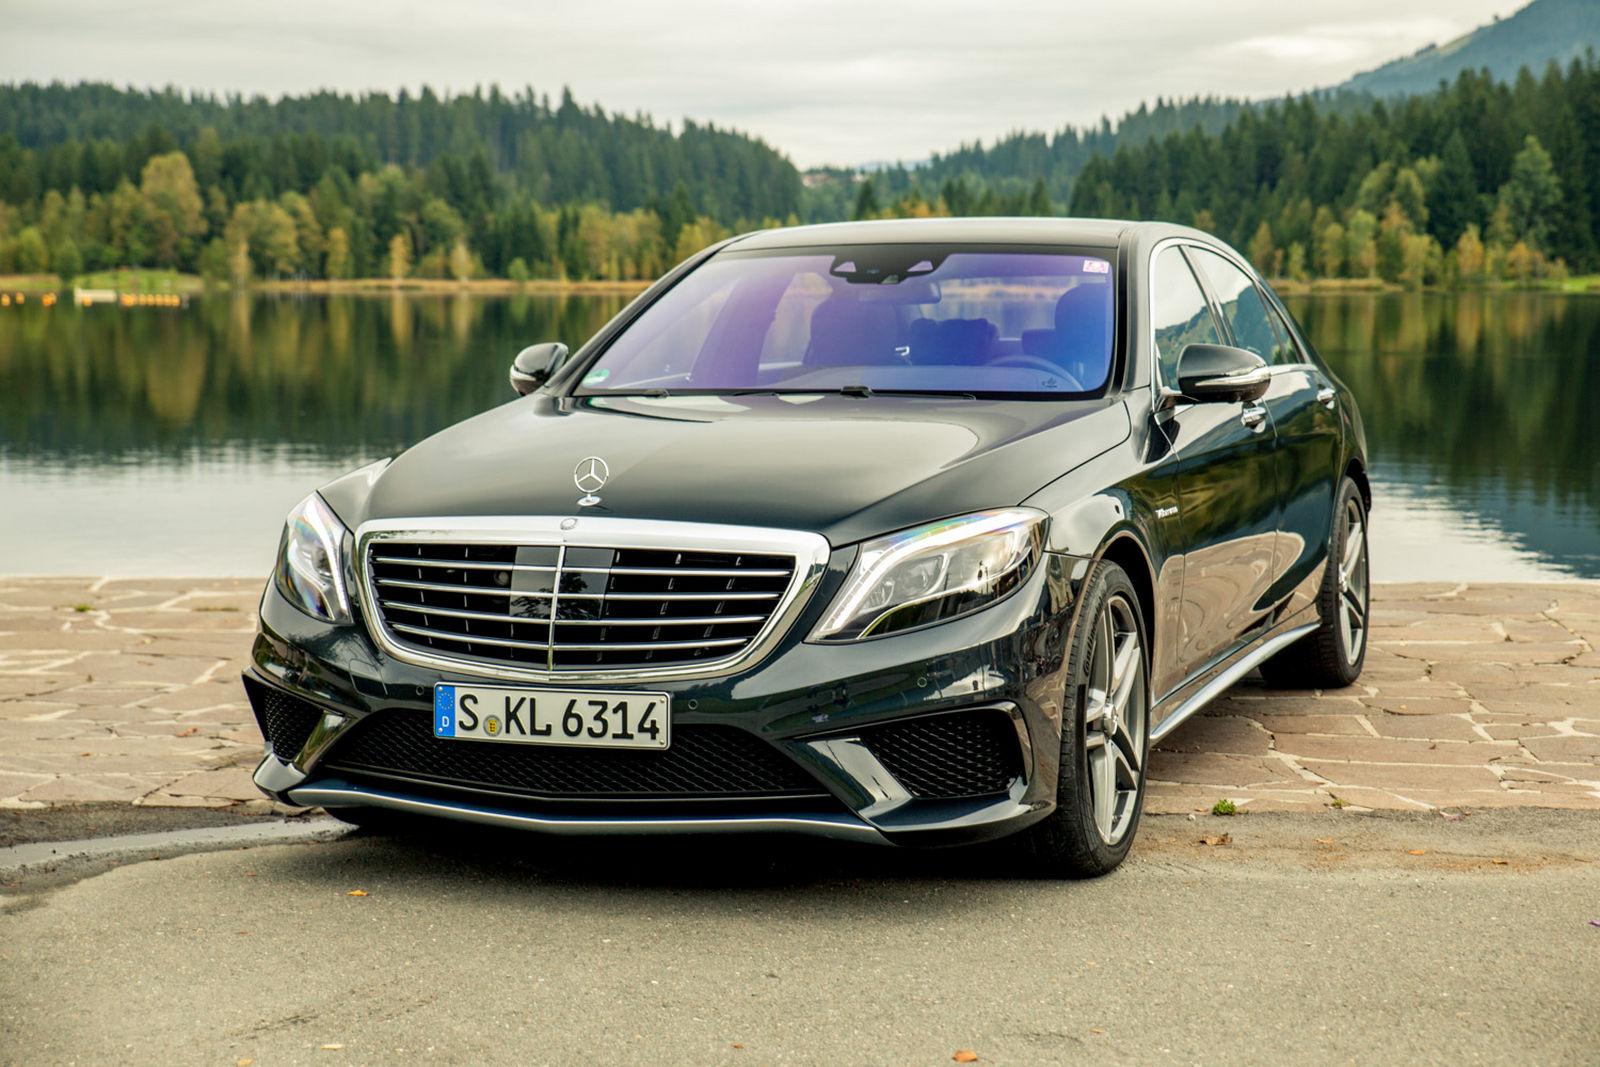 http://www.ultimatecarnegotiators.com/wp-content/uploads/2016/02/Mercedes-S63-AMG-Black.jpg